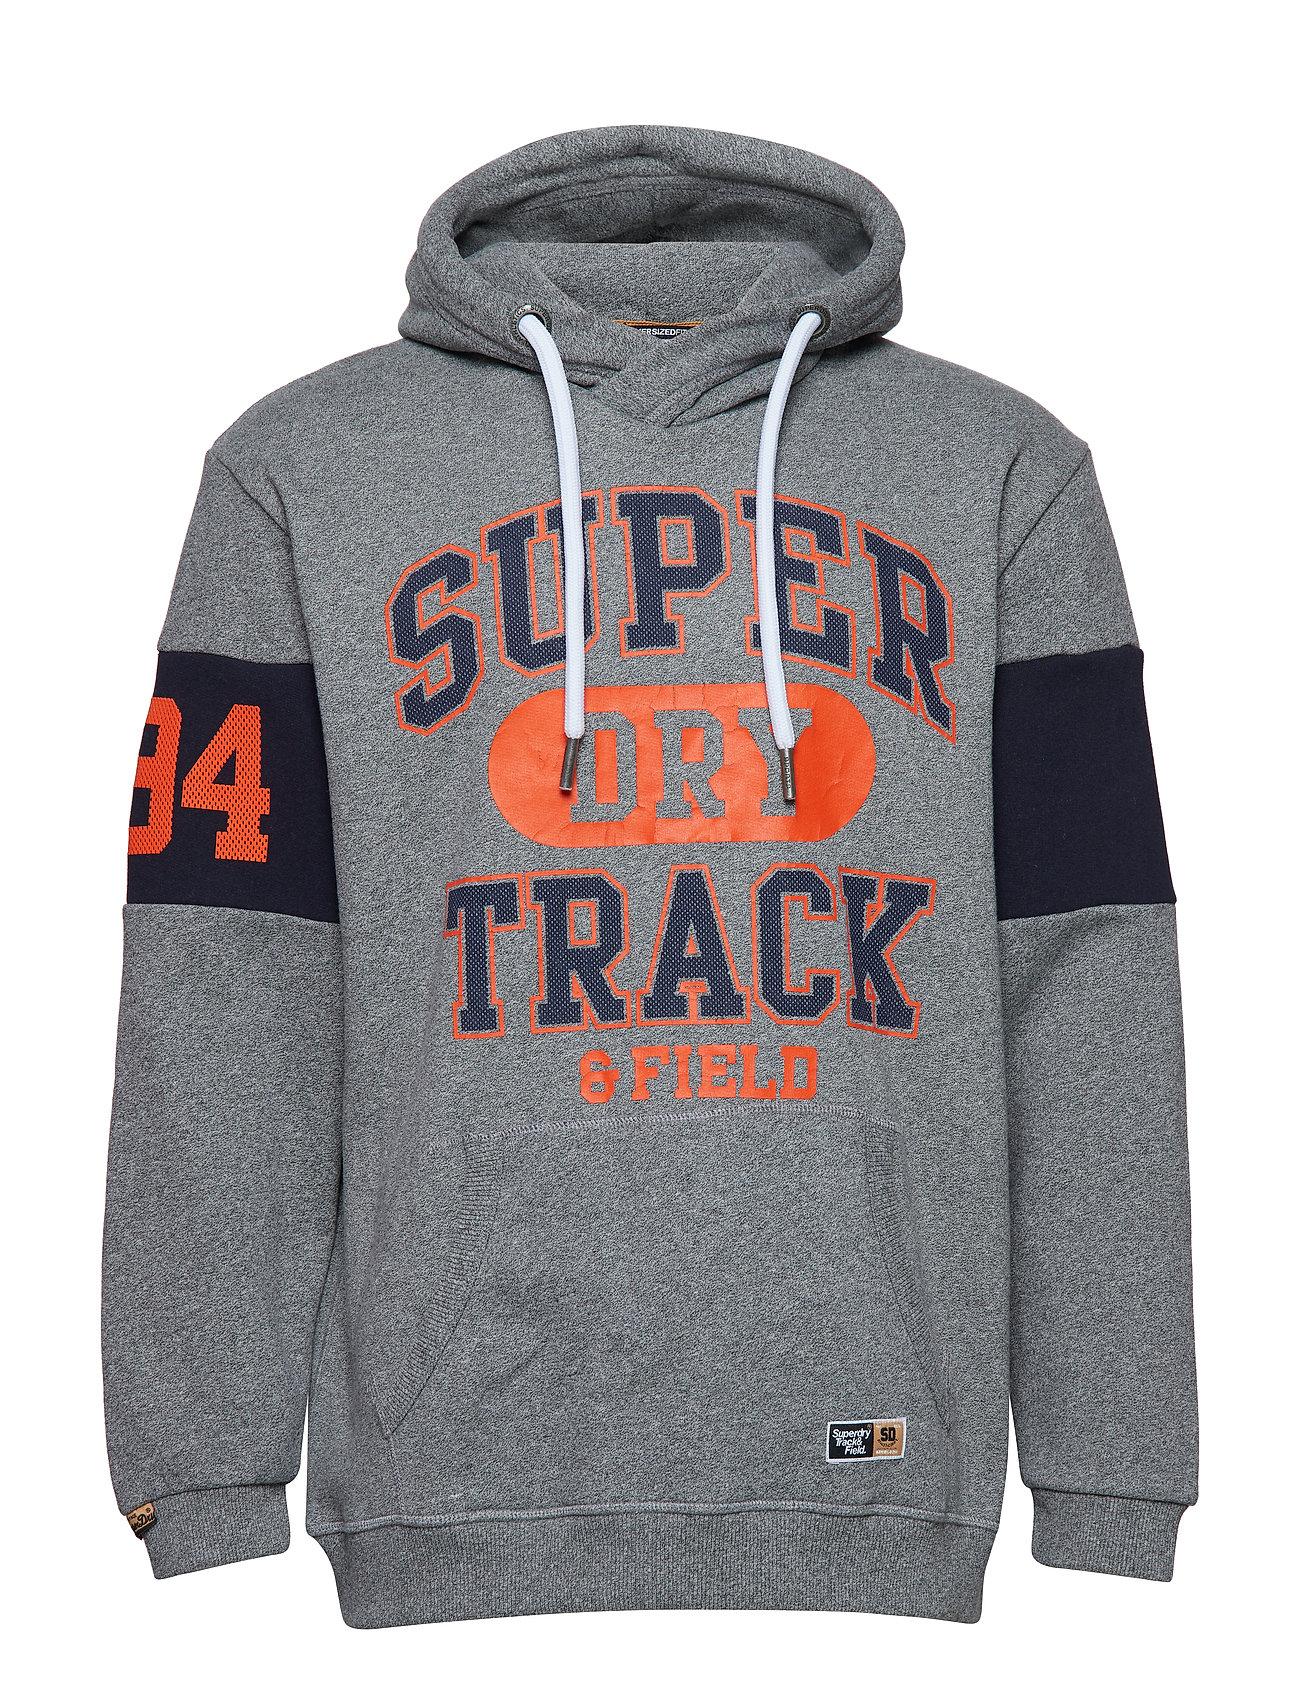 Hoodpodium Mid Grey GritSuperdry Track Super Oversized SLzMUpqGV